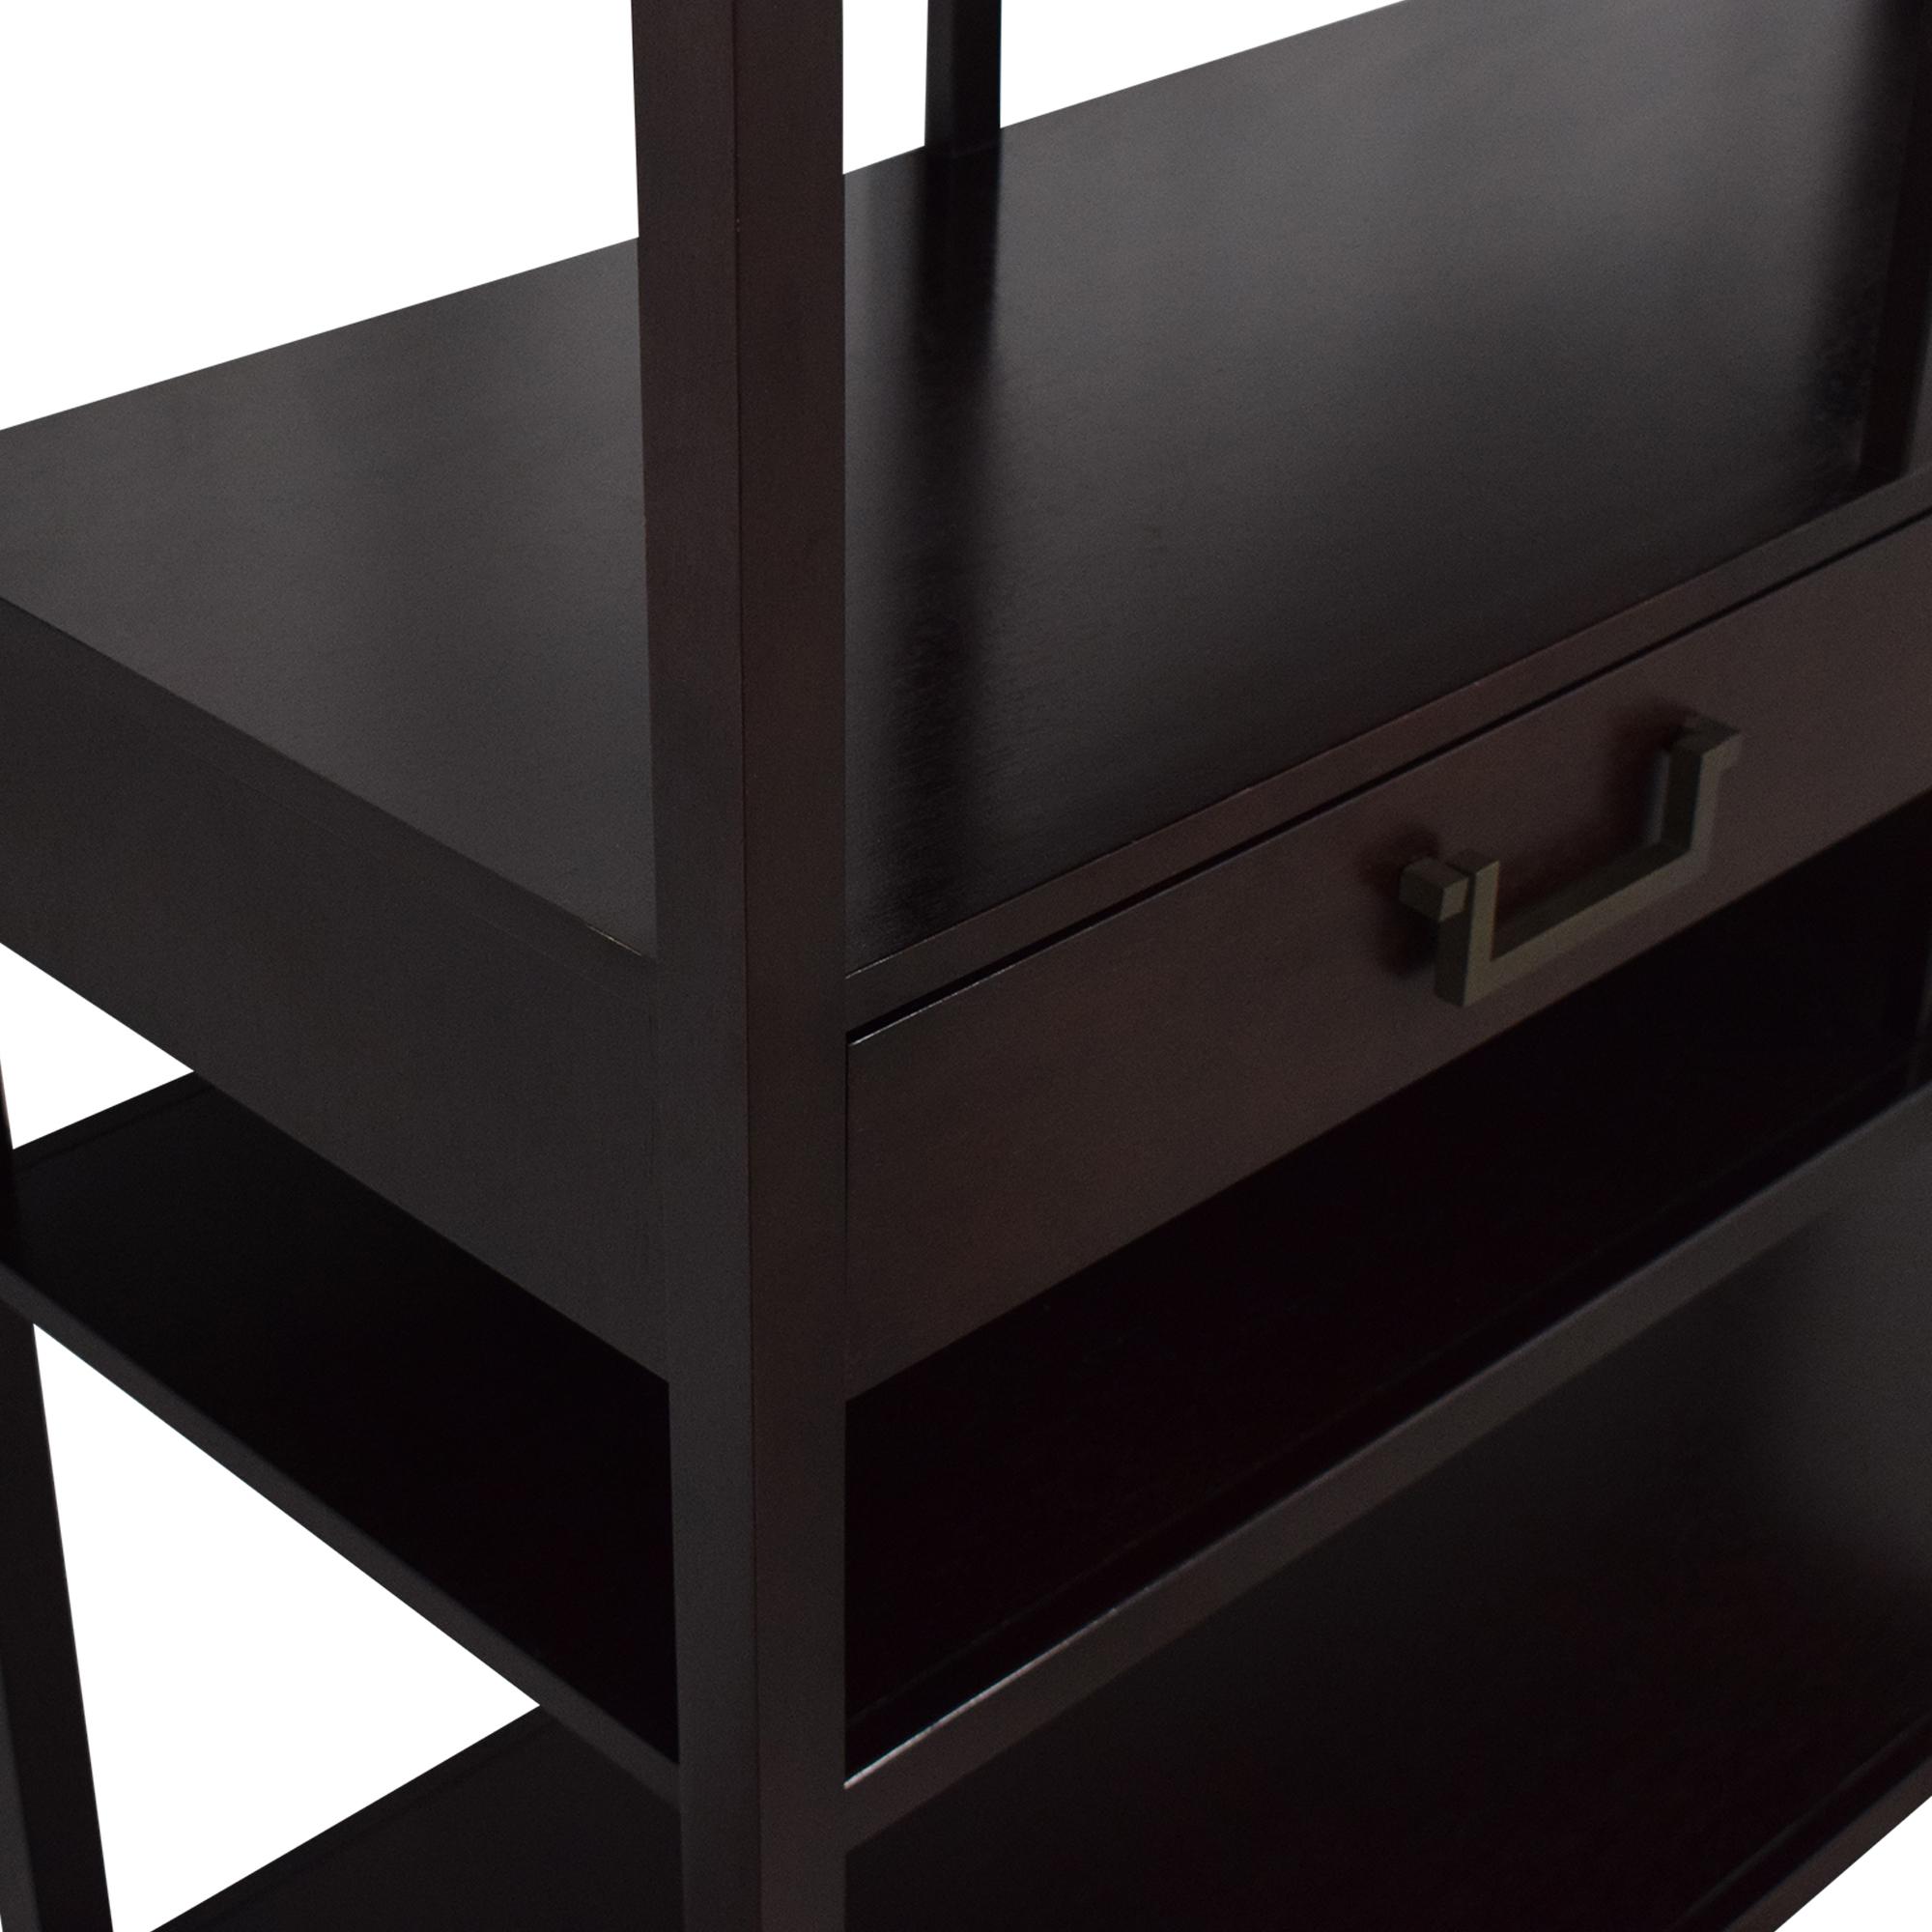 Vanguard Furniture Michael Weiss Modernism by Vanguard Furniture Wood Eterge dimensions